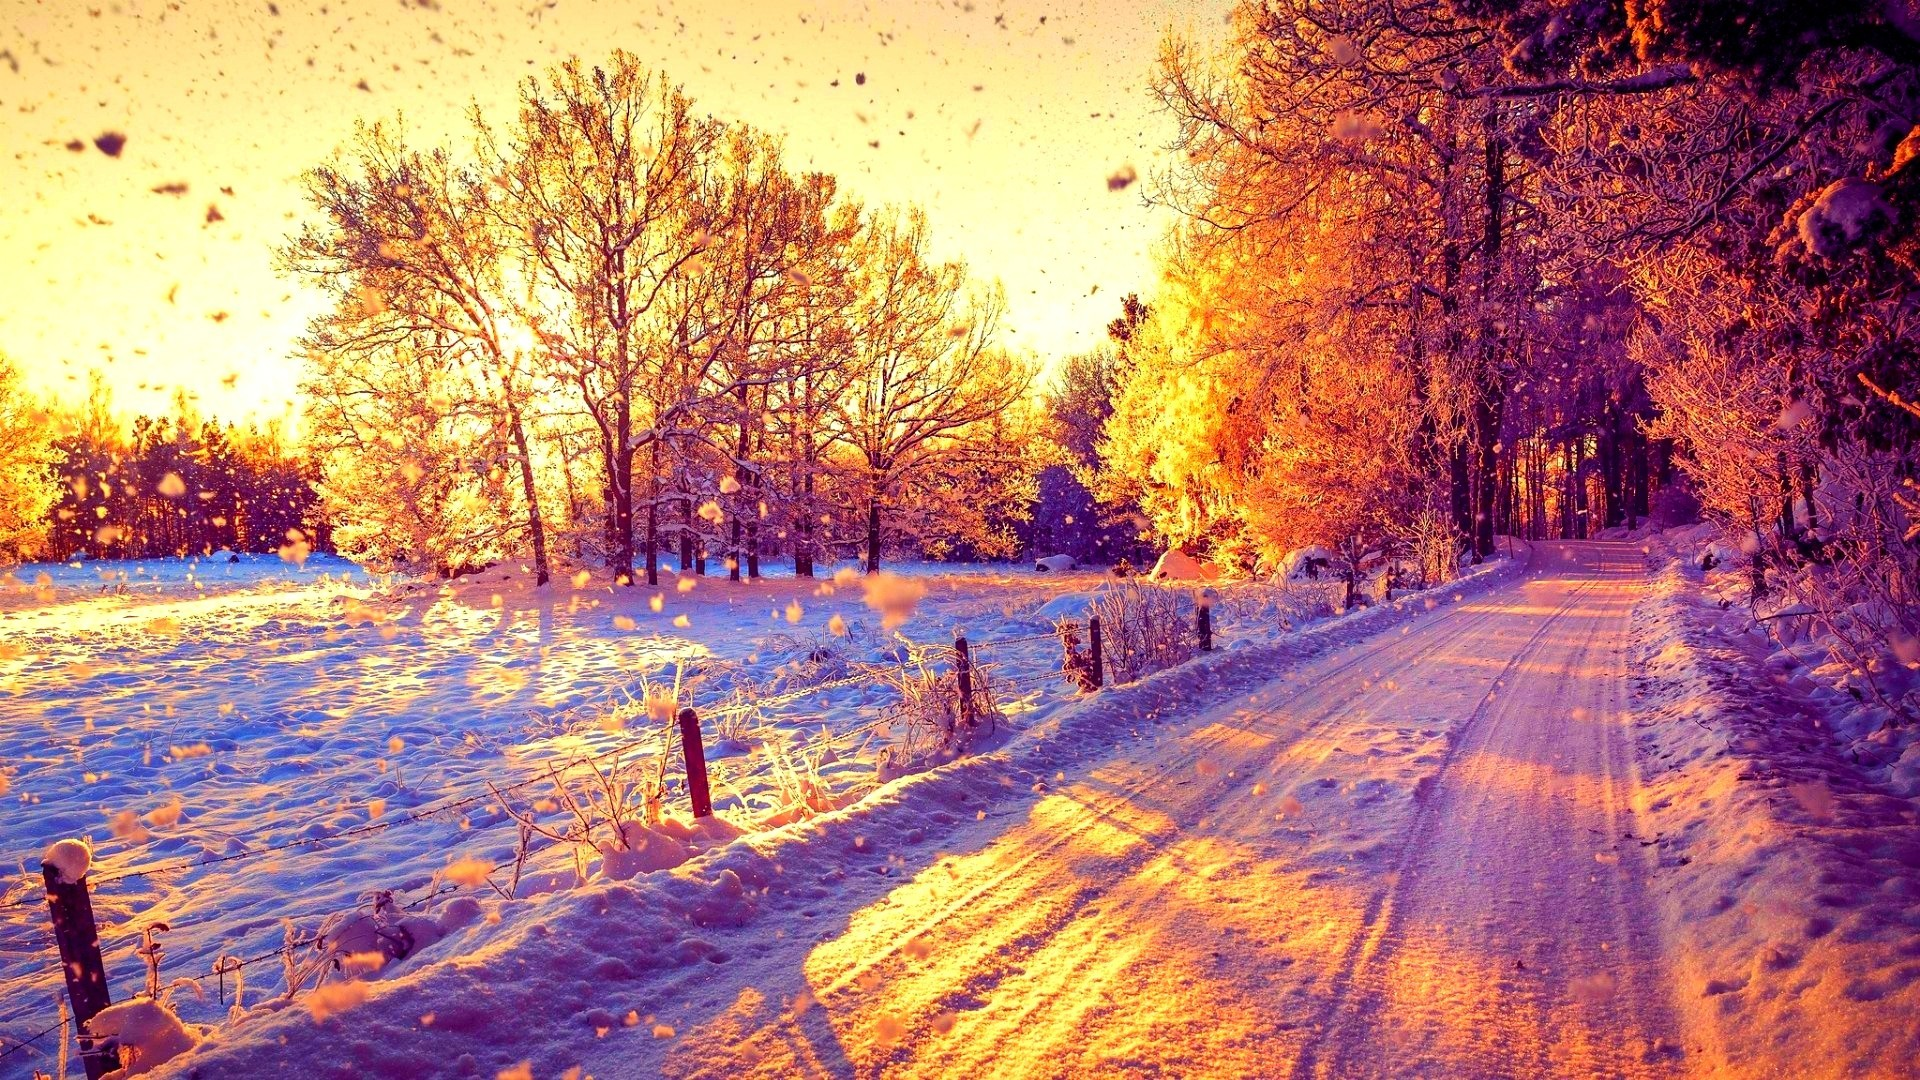 Beautiful Snow Forest Winter Sun Trees Nature Sunny Road Sunset Sunshine  Amazing Wallpaper Iphone 6 Plus